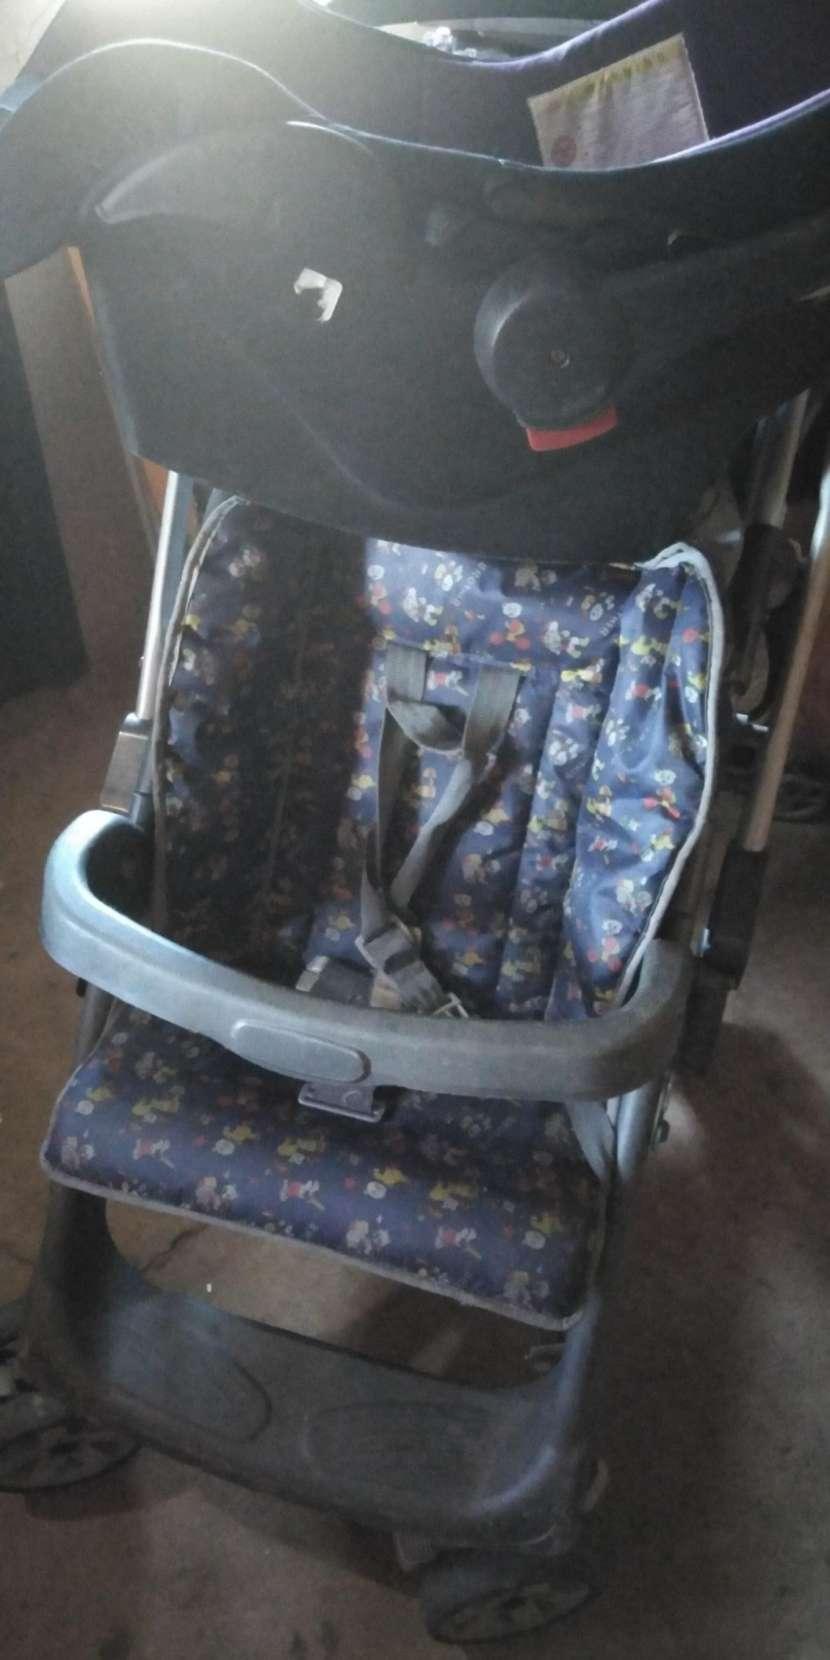 Carrito unicef y baby sit - 0